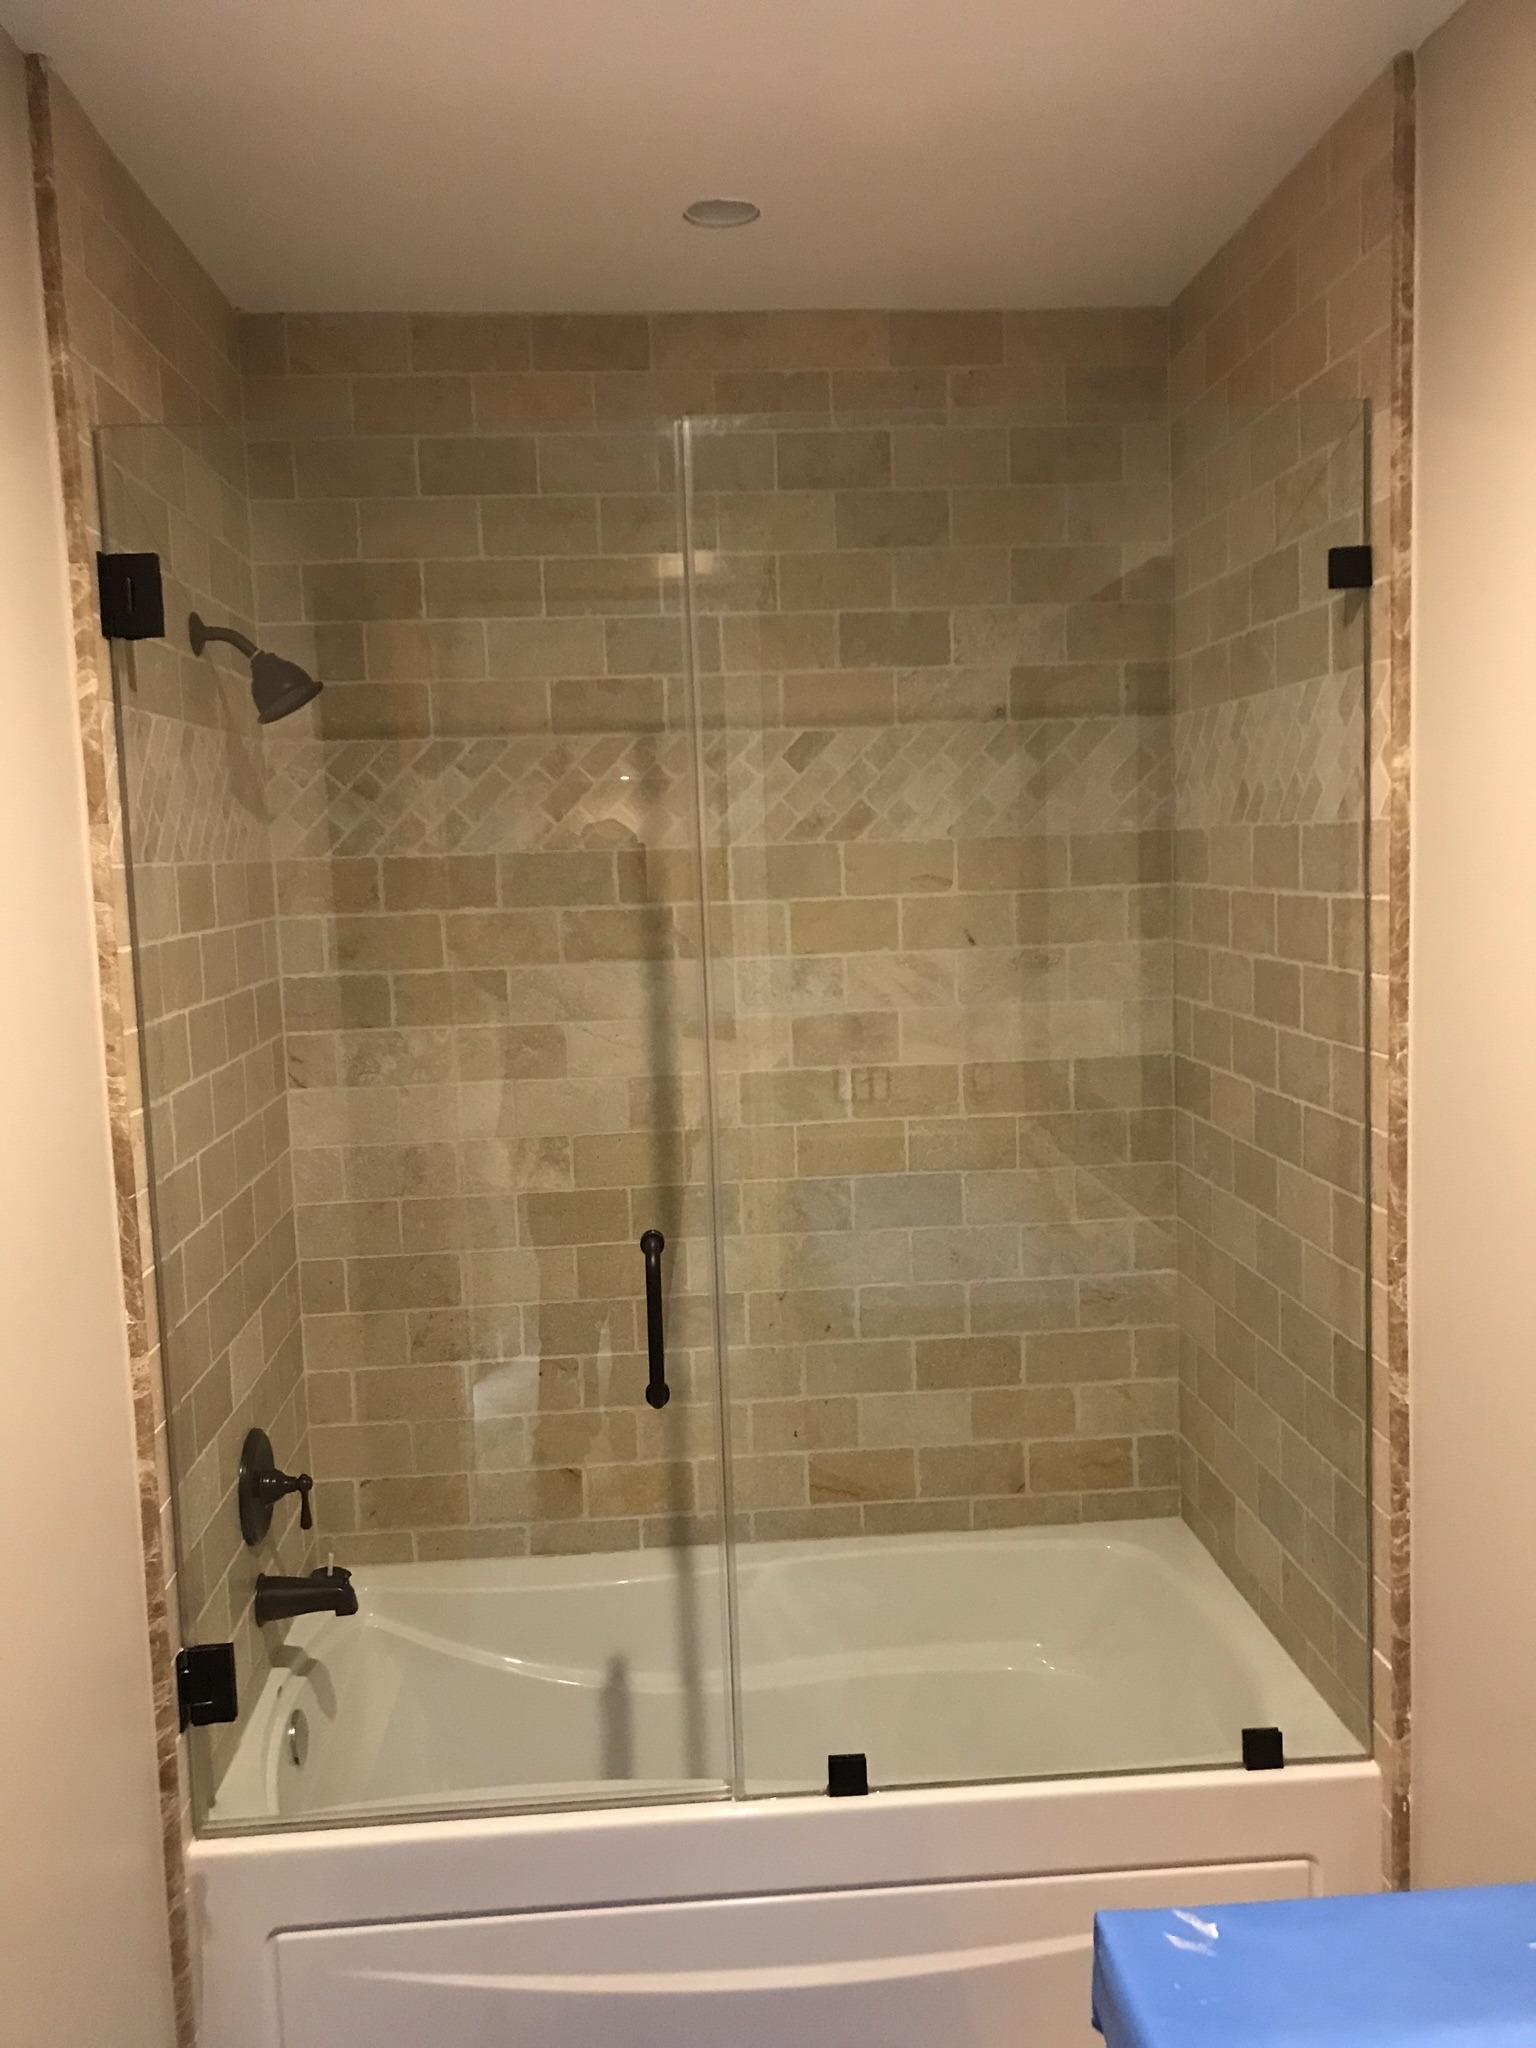 Bath Tub Shower Doors Las Vegas Shower Doors Fot Tubs A